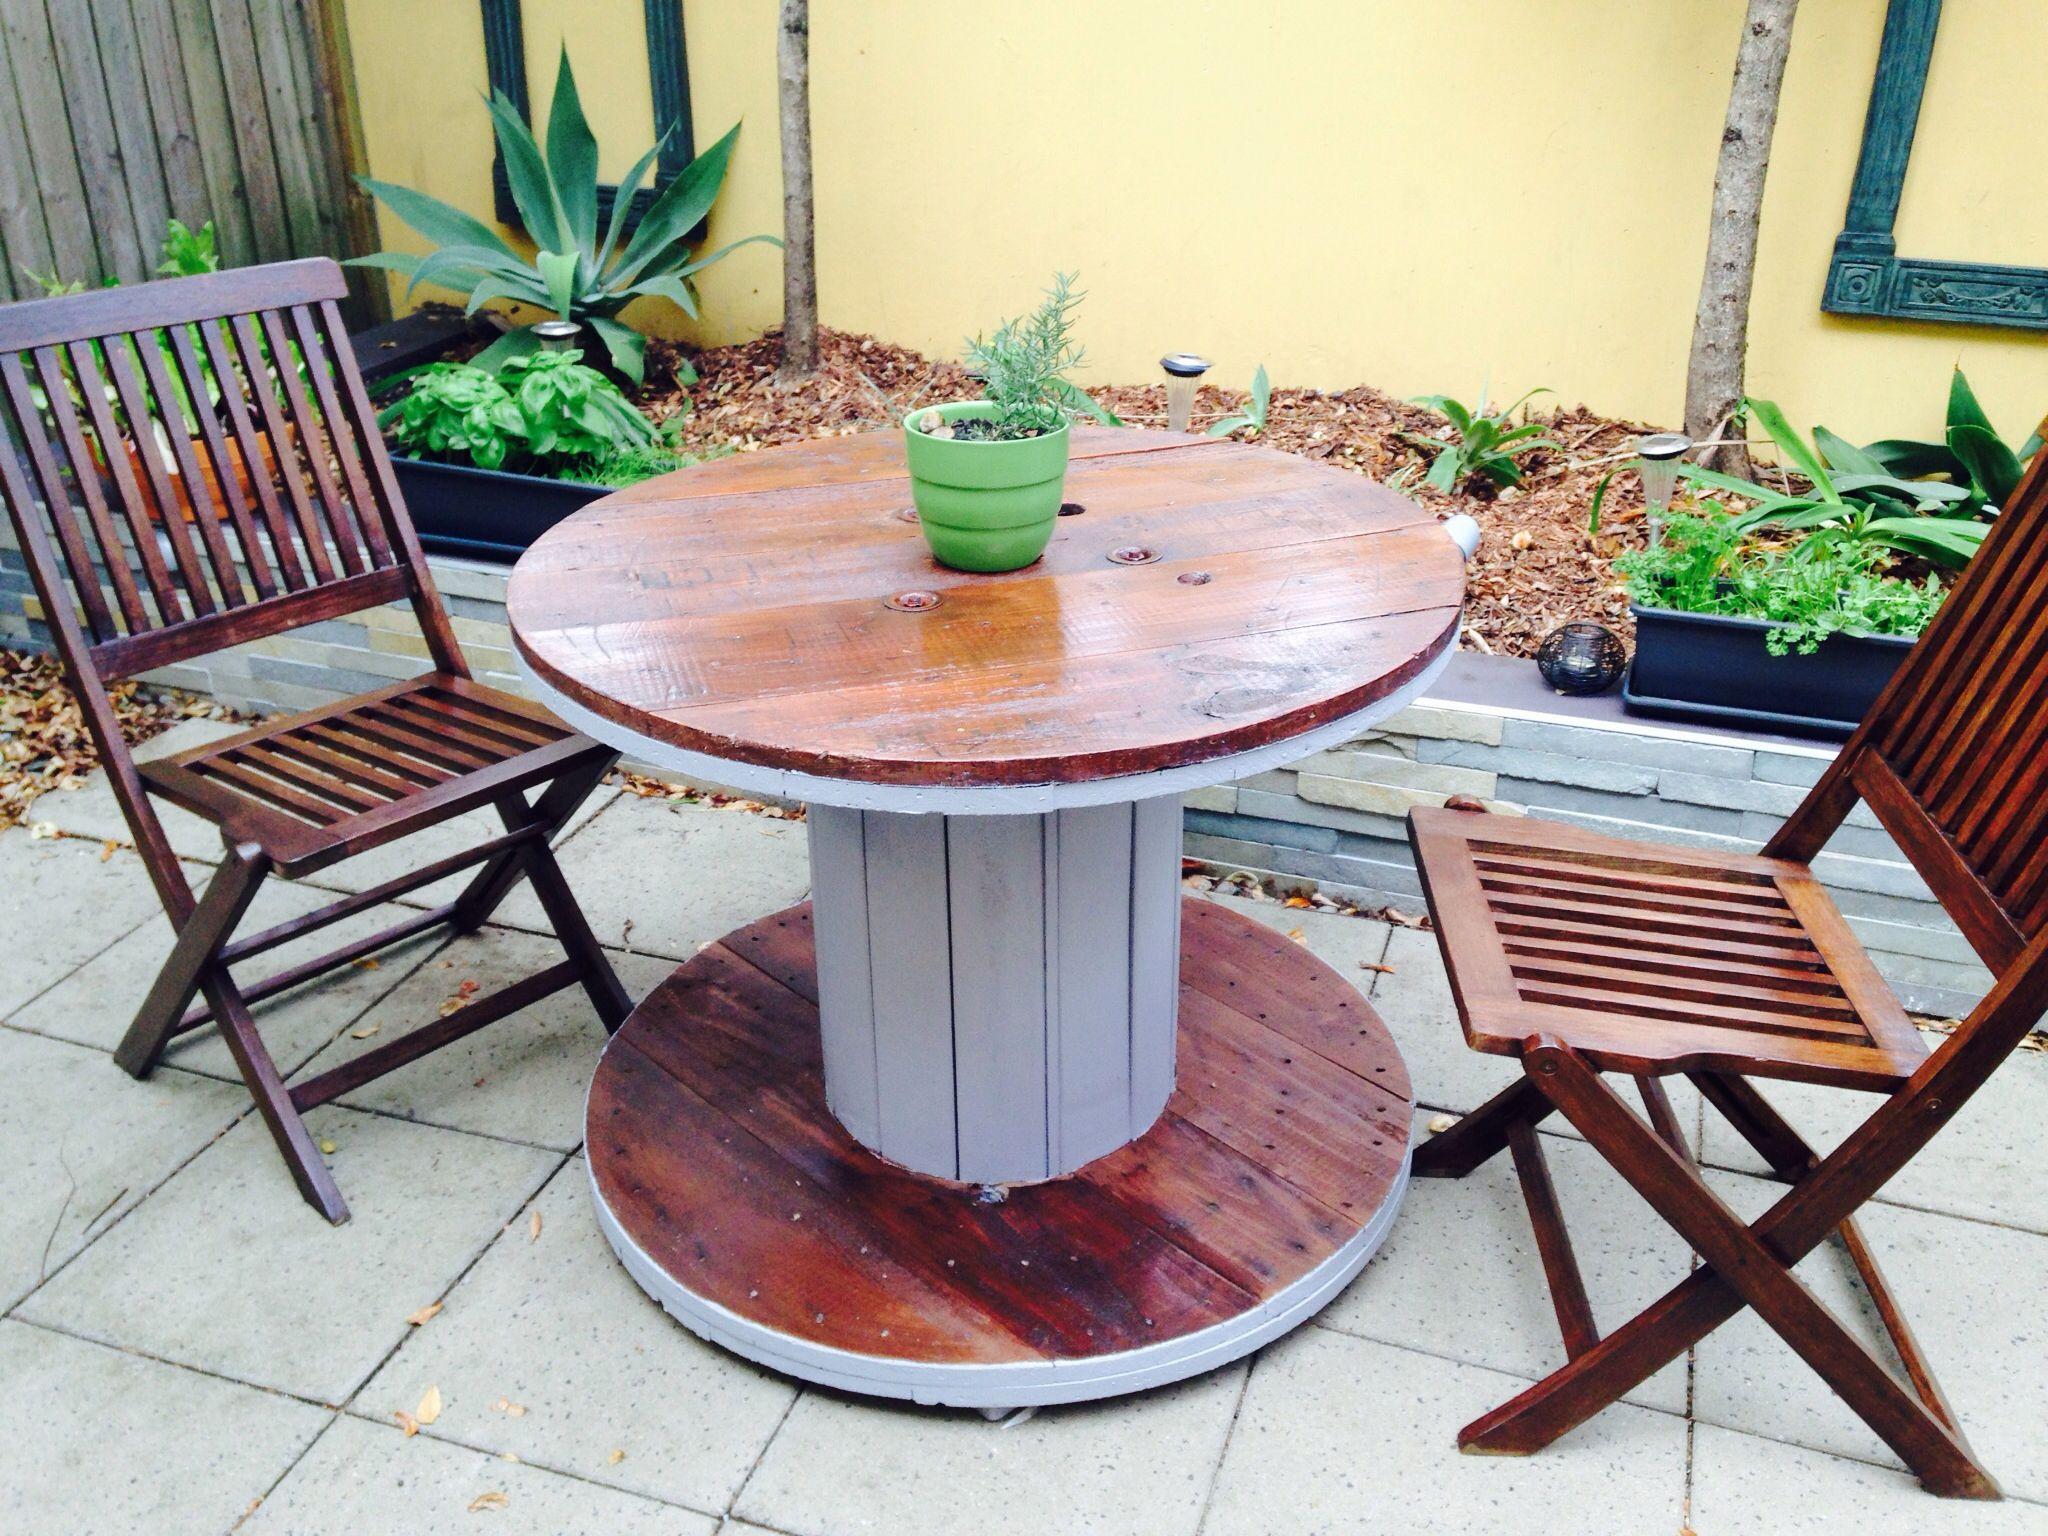 DIY Outdoor Wooden Table  Cable Reel Outdoor Table DIY